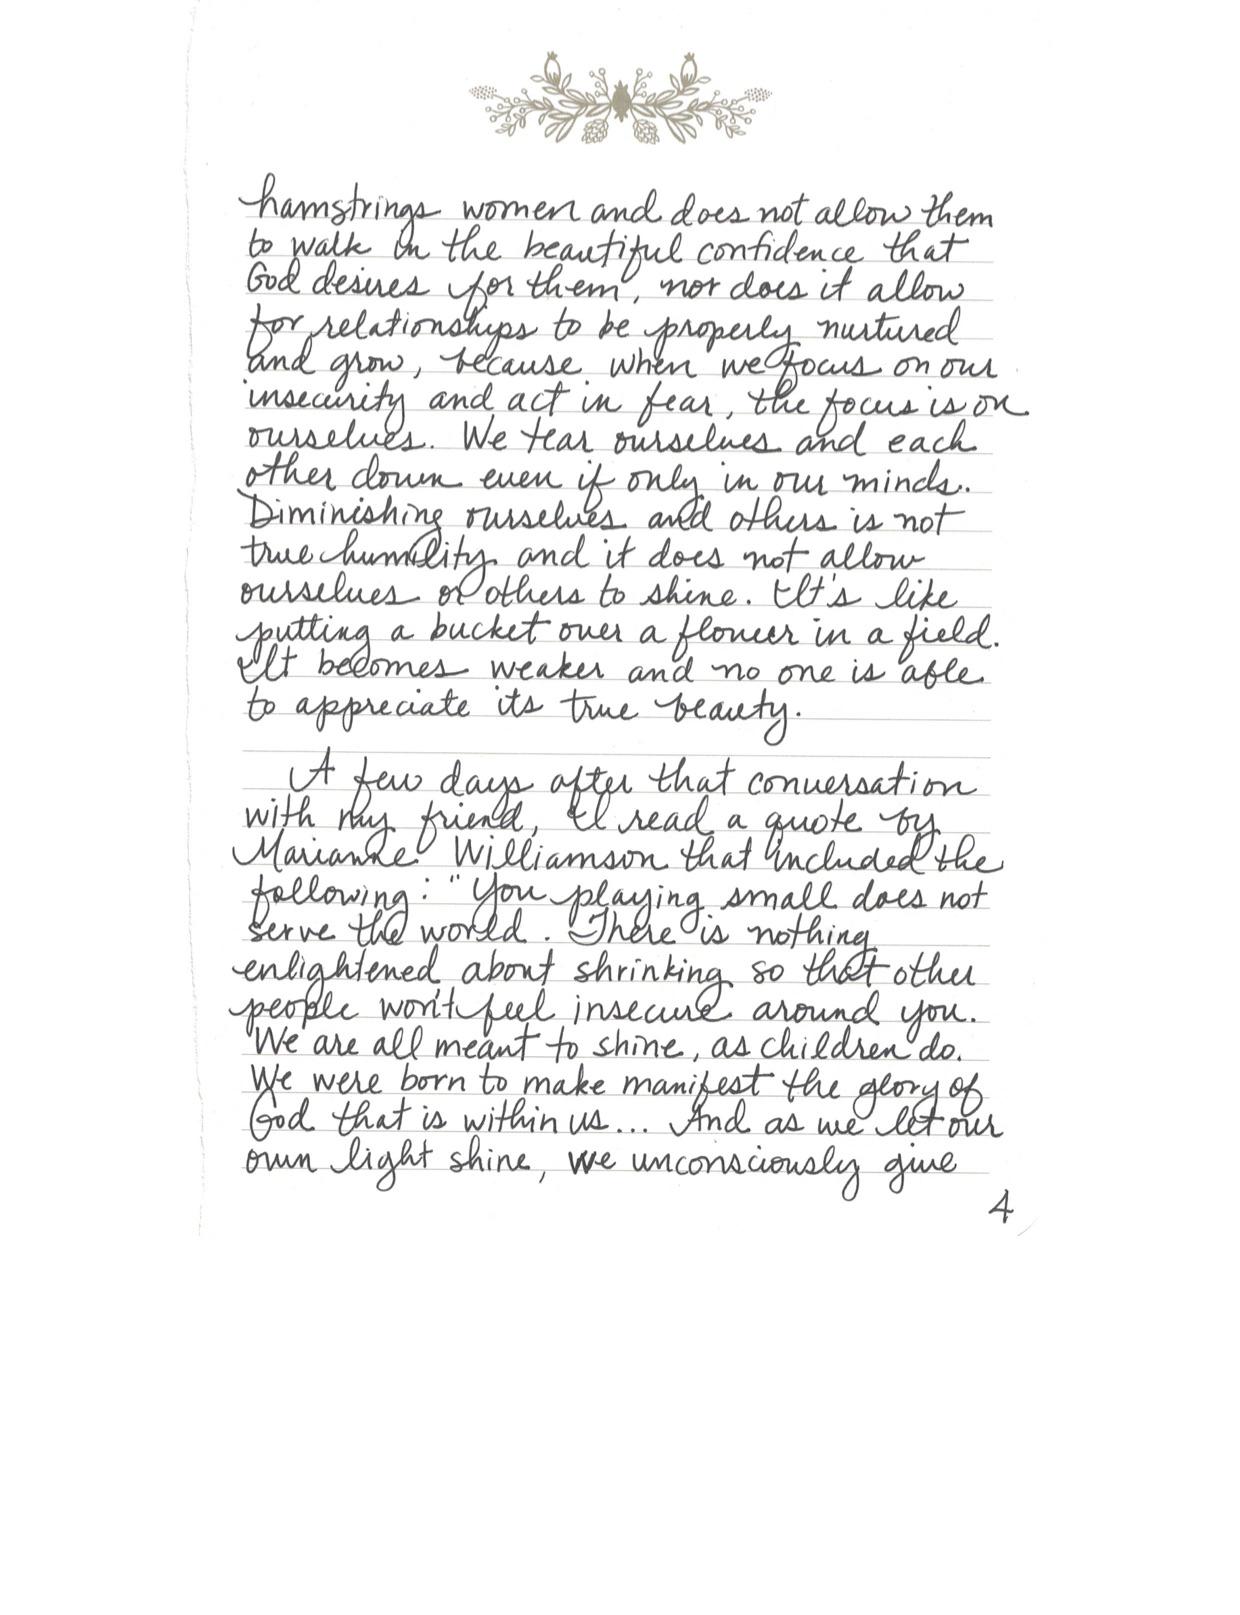 DeAnn_Malcolm_Handwritten4.jpg